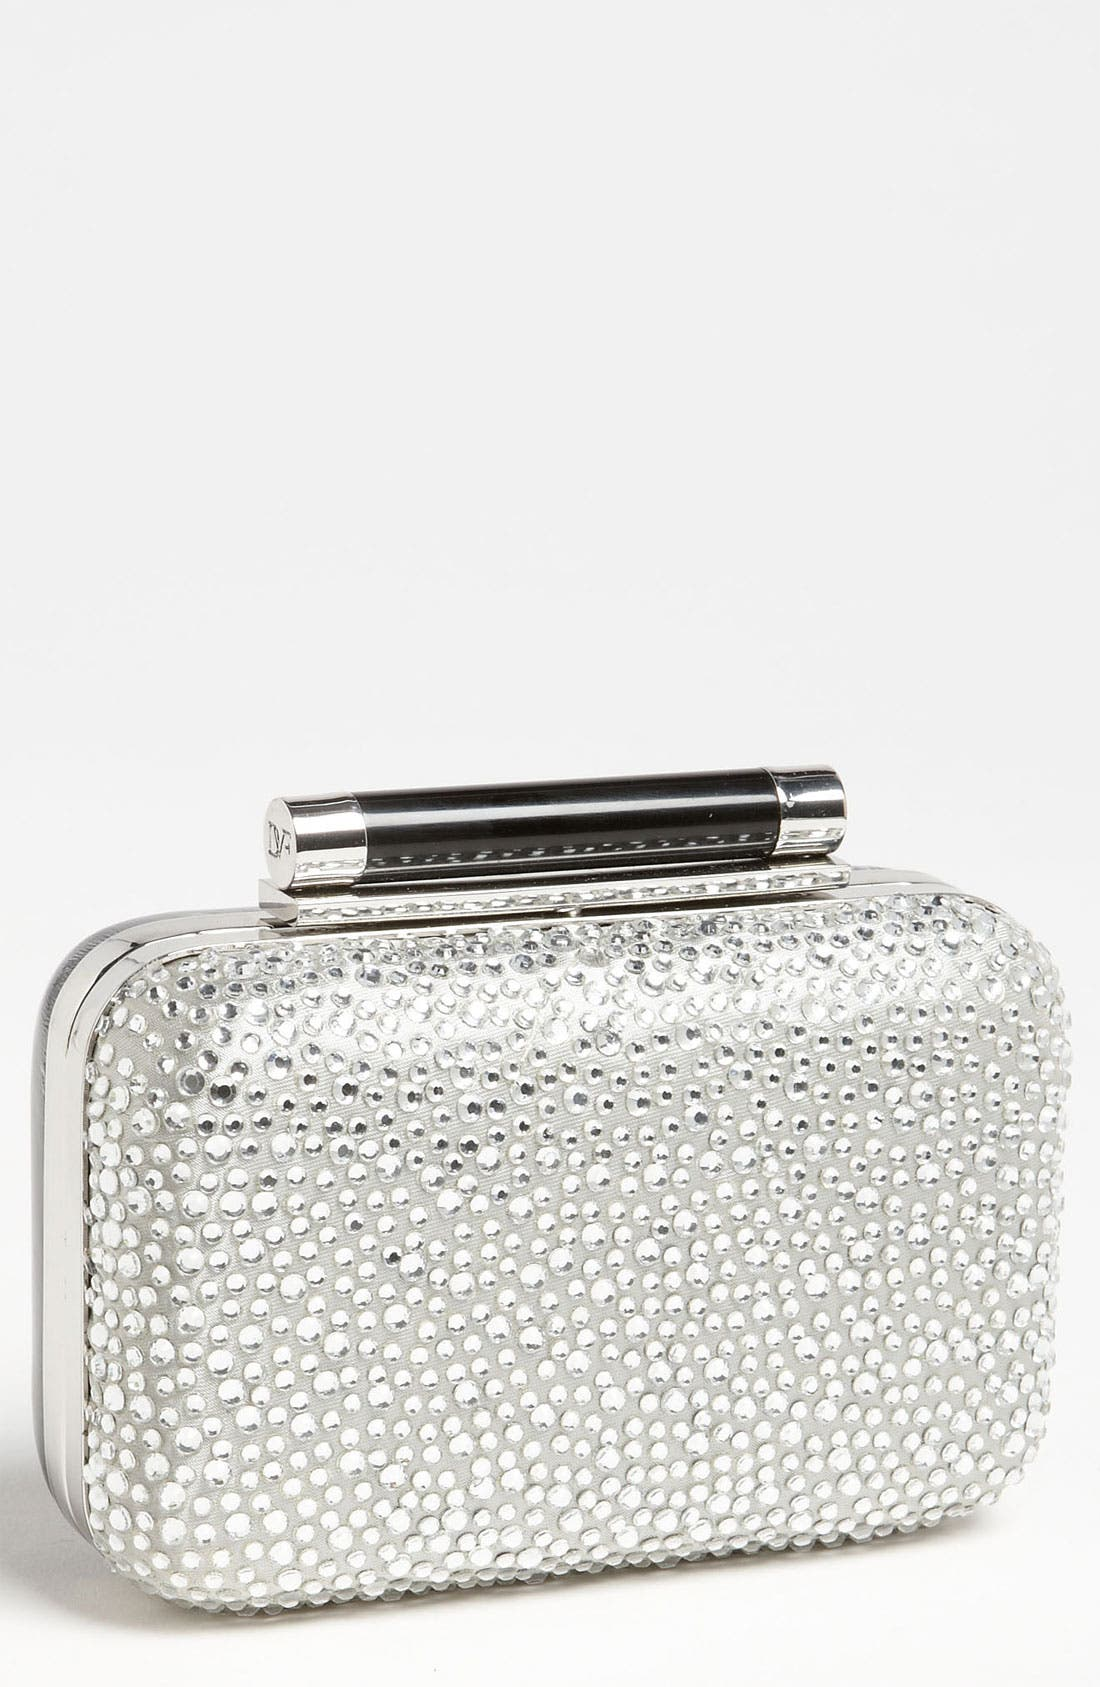 Main Image - Diane von Furstenberg 'Tonda - Small' Pavé Crystal & Patent Leather Clutch